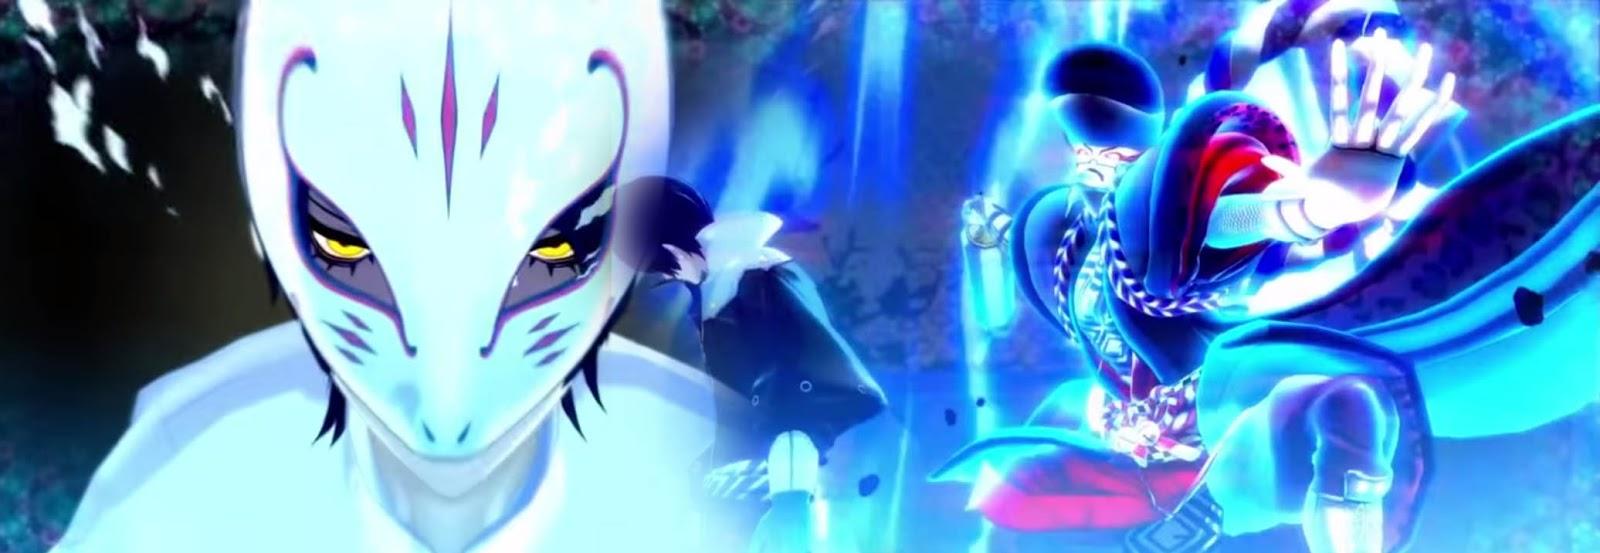 Persona 5 PV 03 Trailer Yusuke Kitagawa and Persona